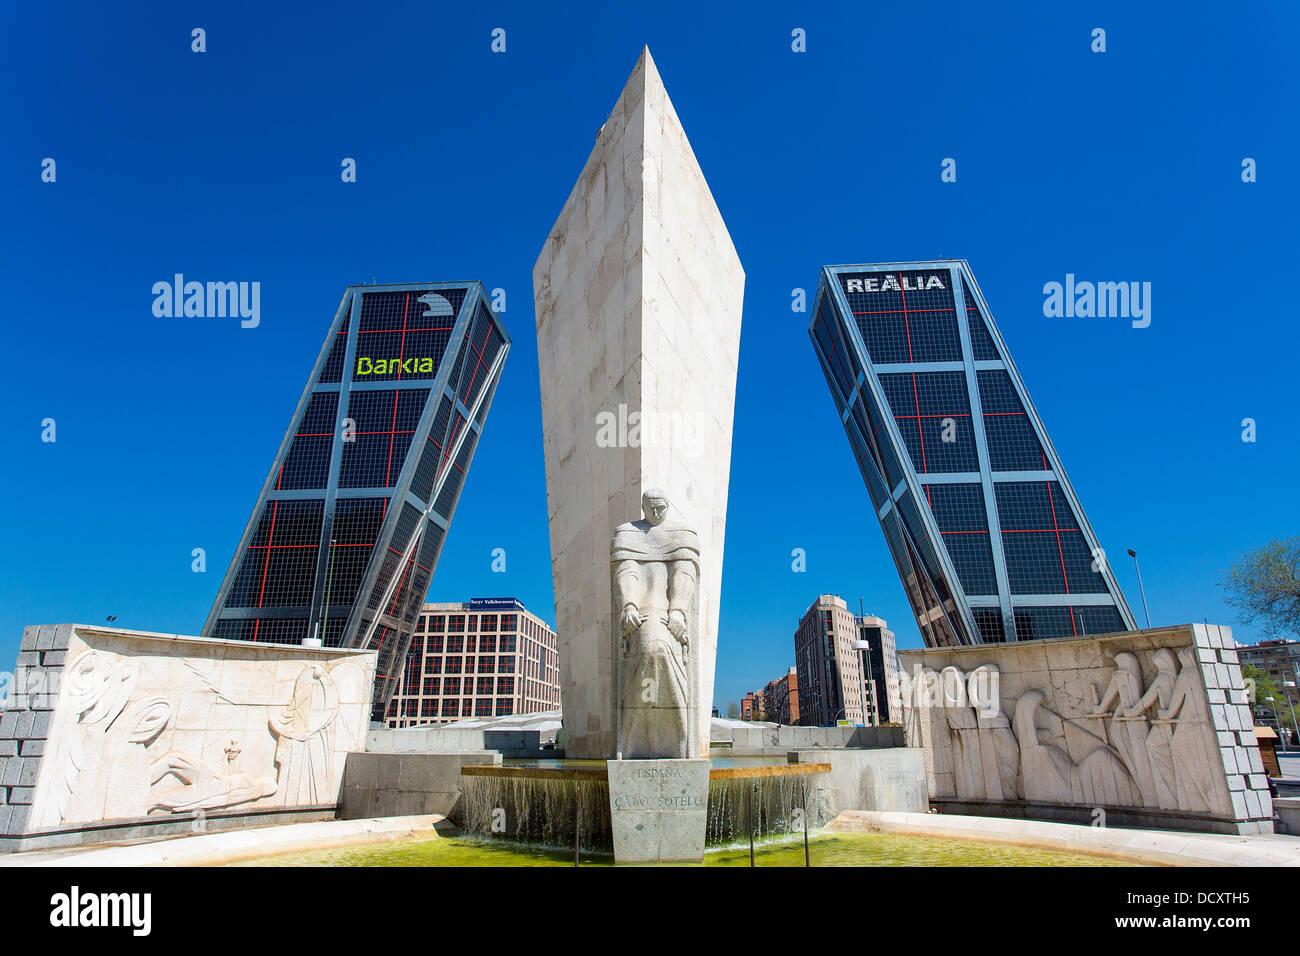 Madrid, Puerta de Europa Immagini Stock